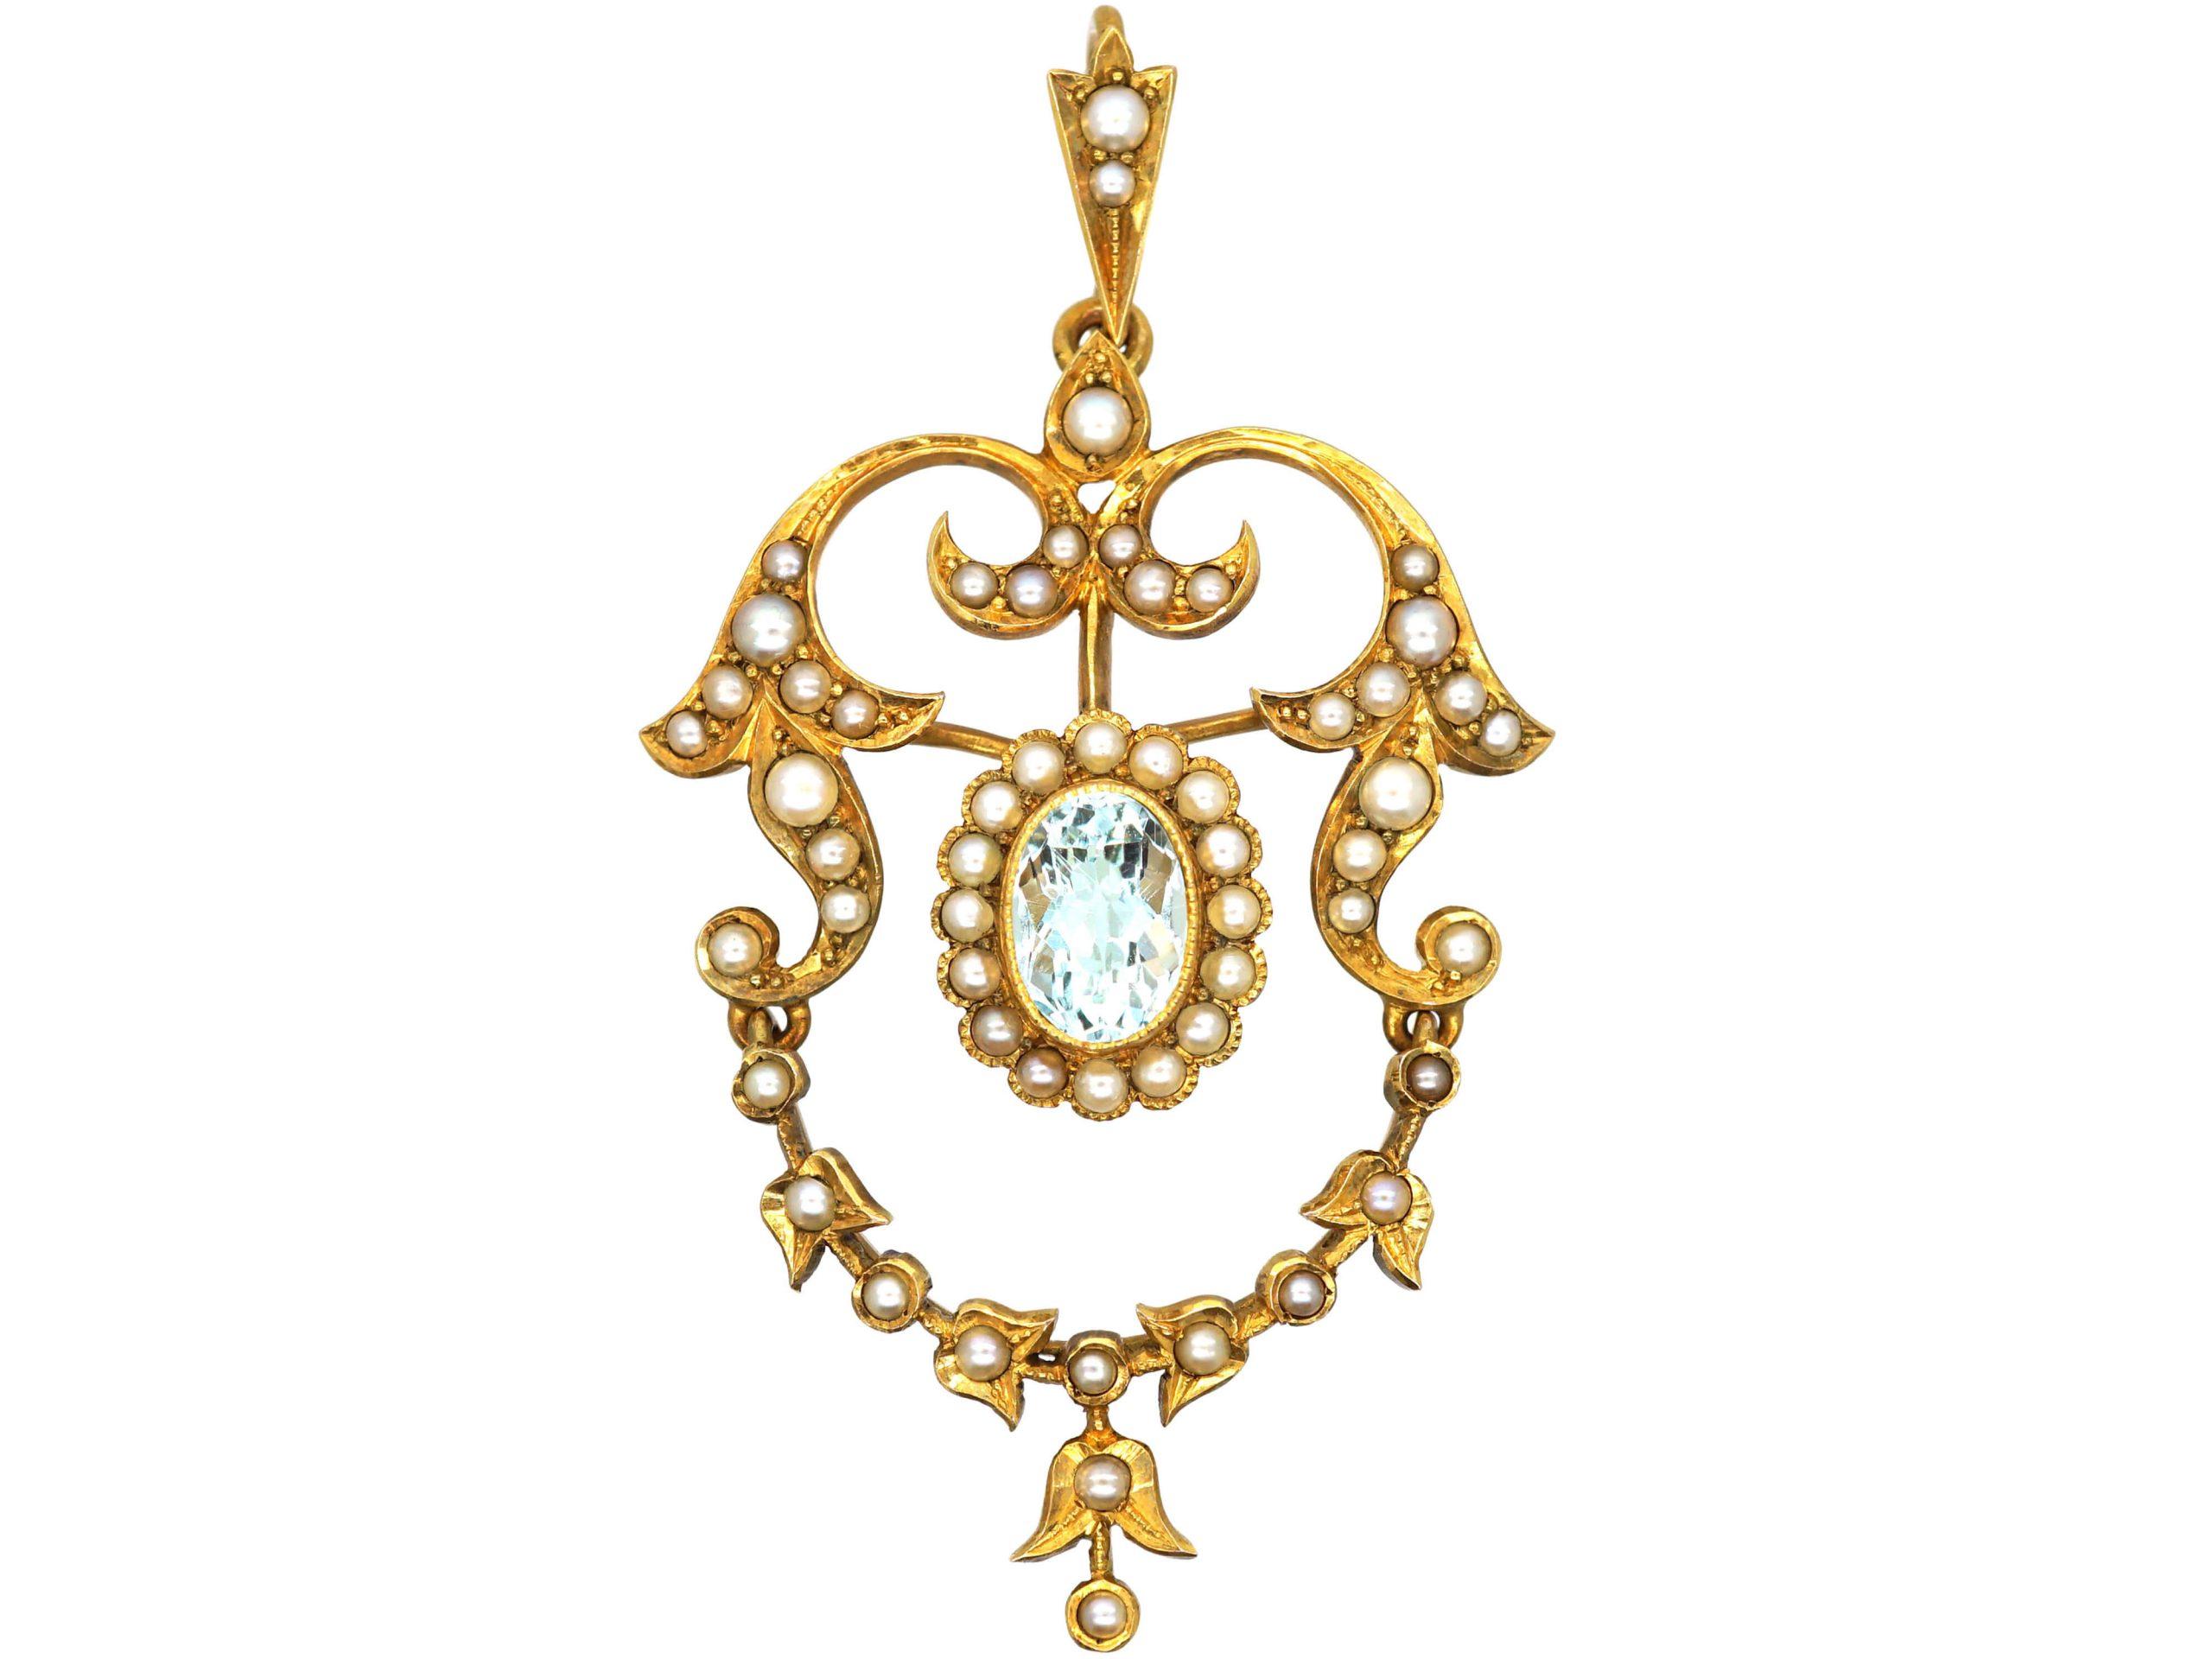 Edwardian 15ct Gold, Aquamarine & Natural Split Pearls Pendant